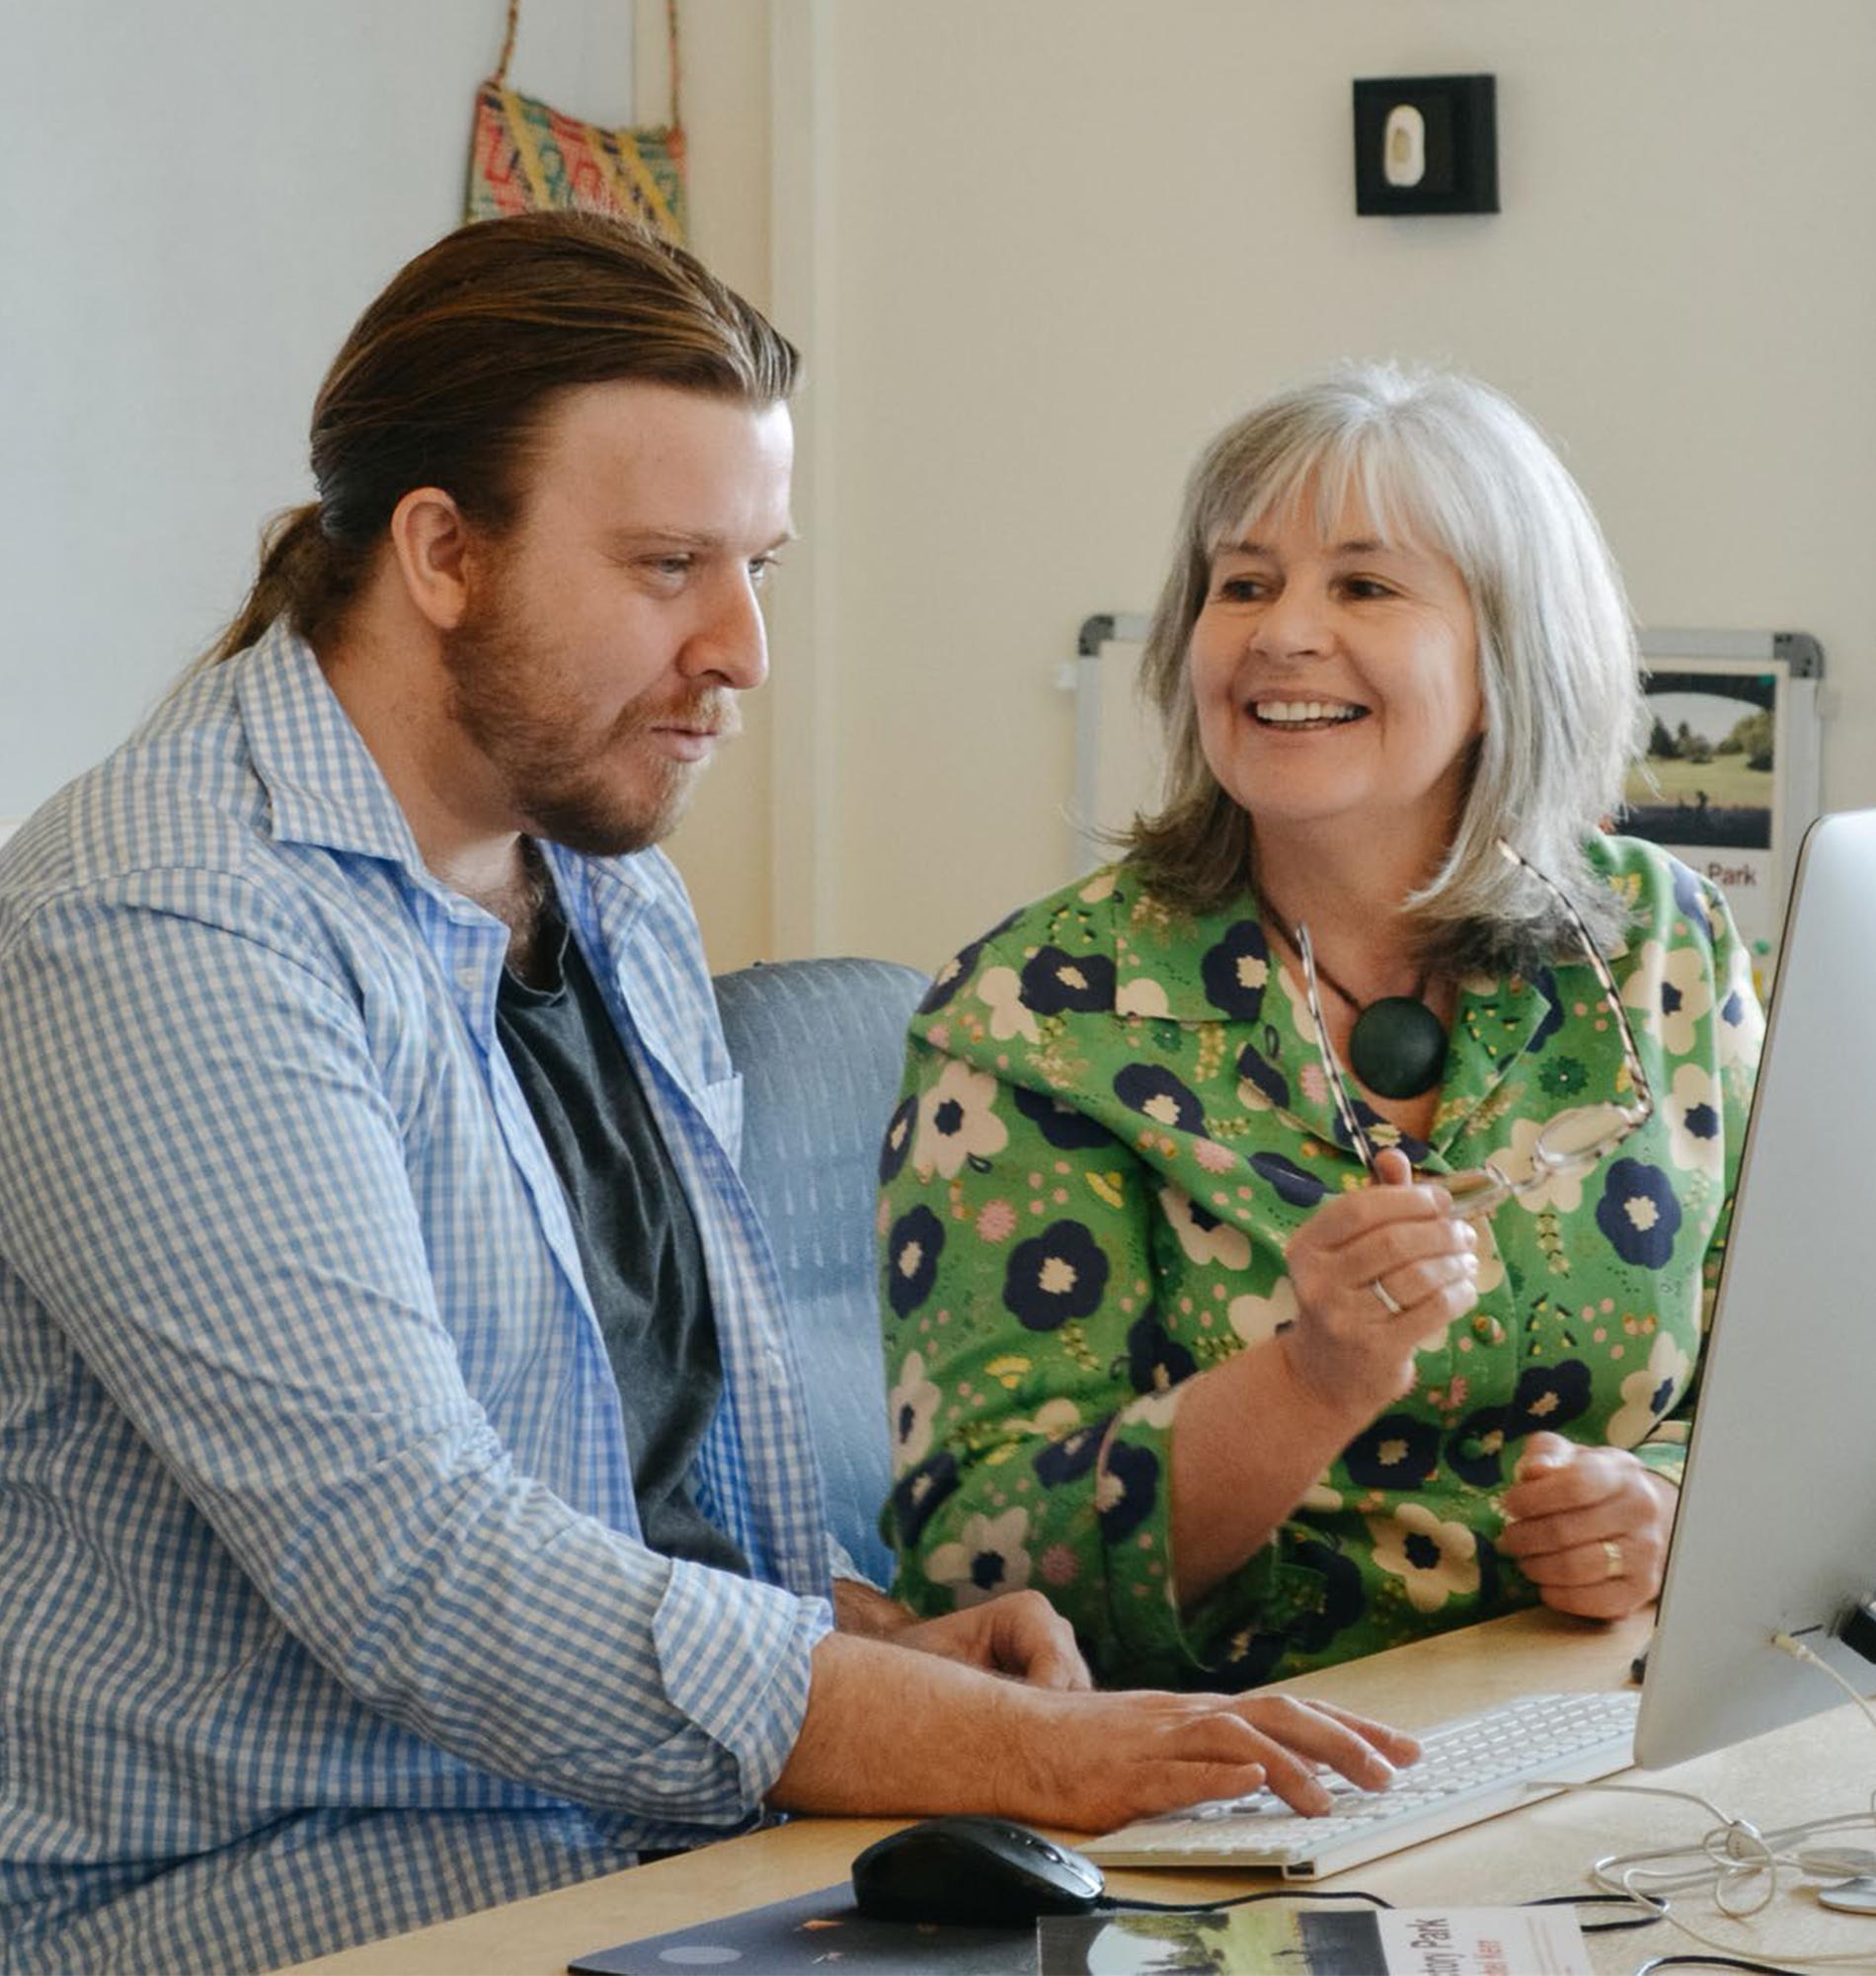 Paul Stewart and Mary McCallum of Mākaro Press